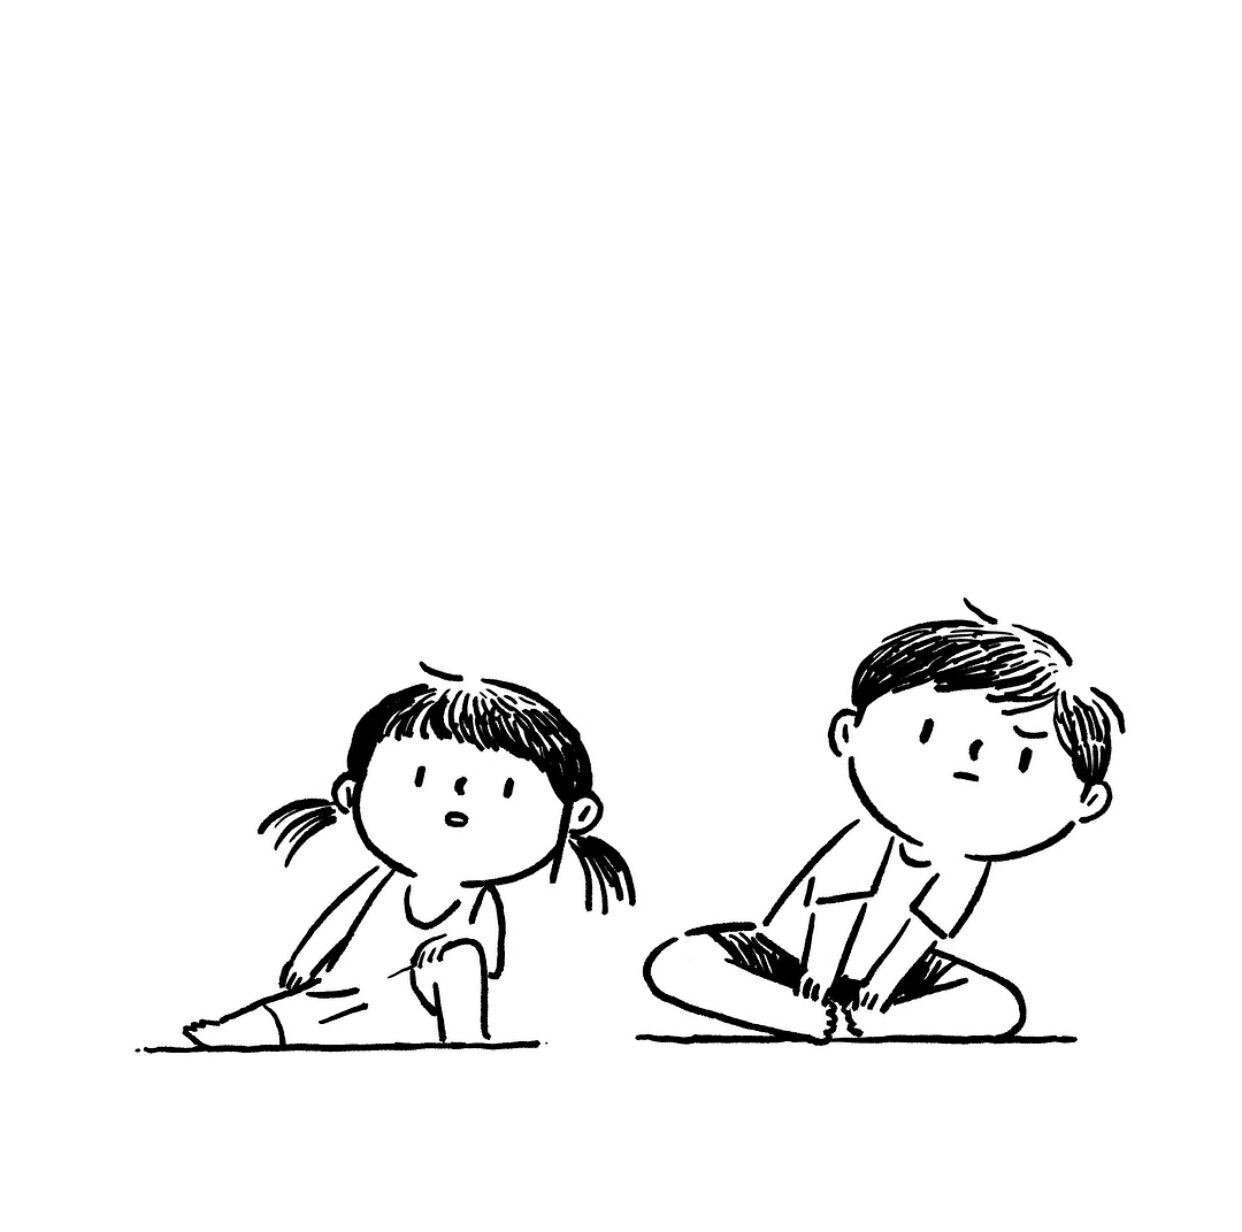 Kartun Pasangan Gambar Gambar Profil Gambar Foto Profil Gambar